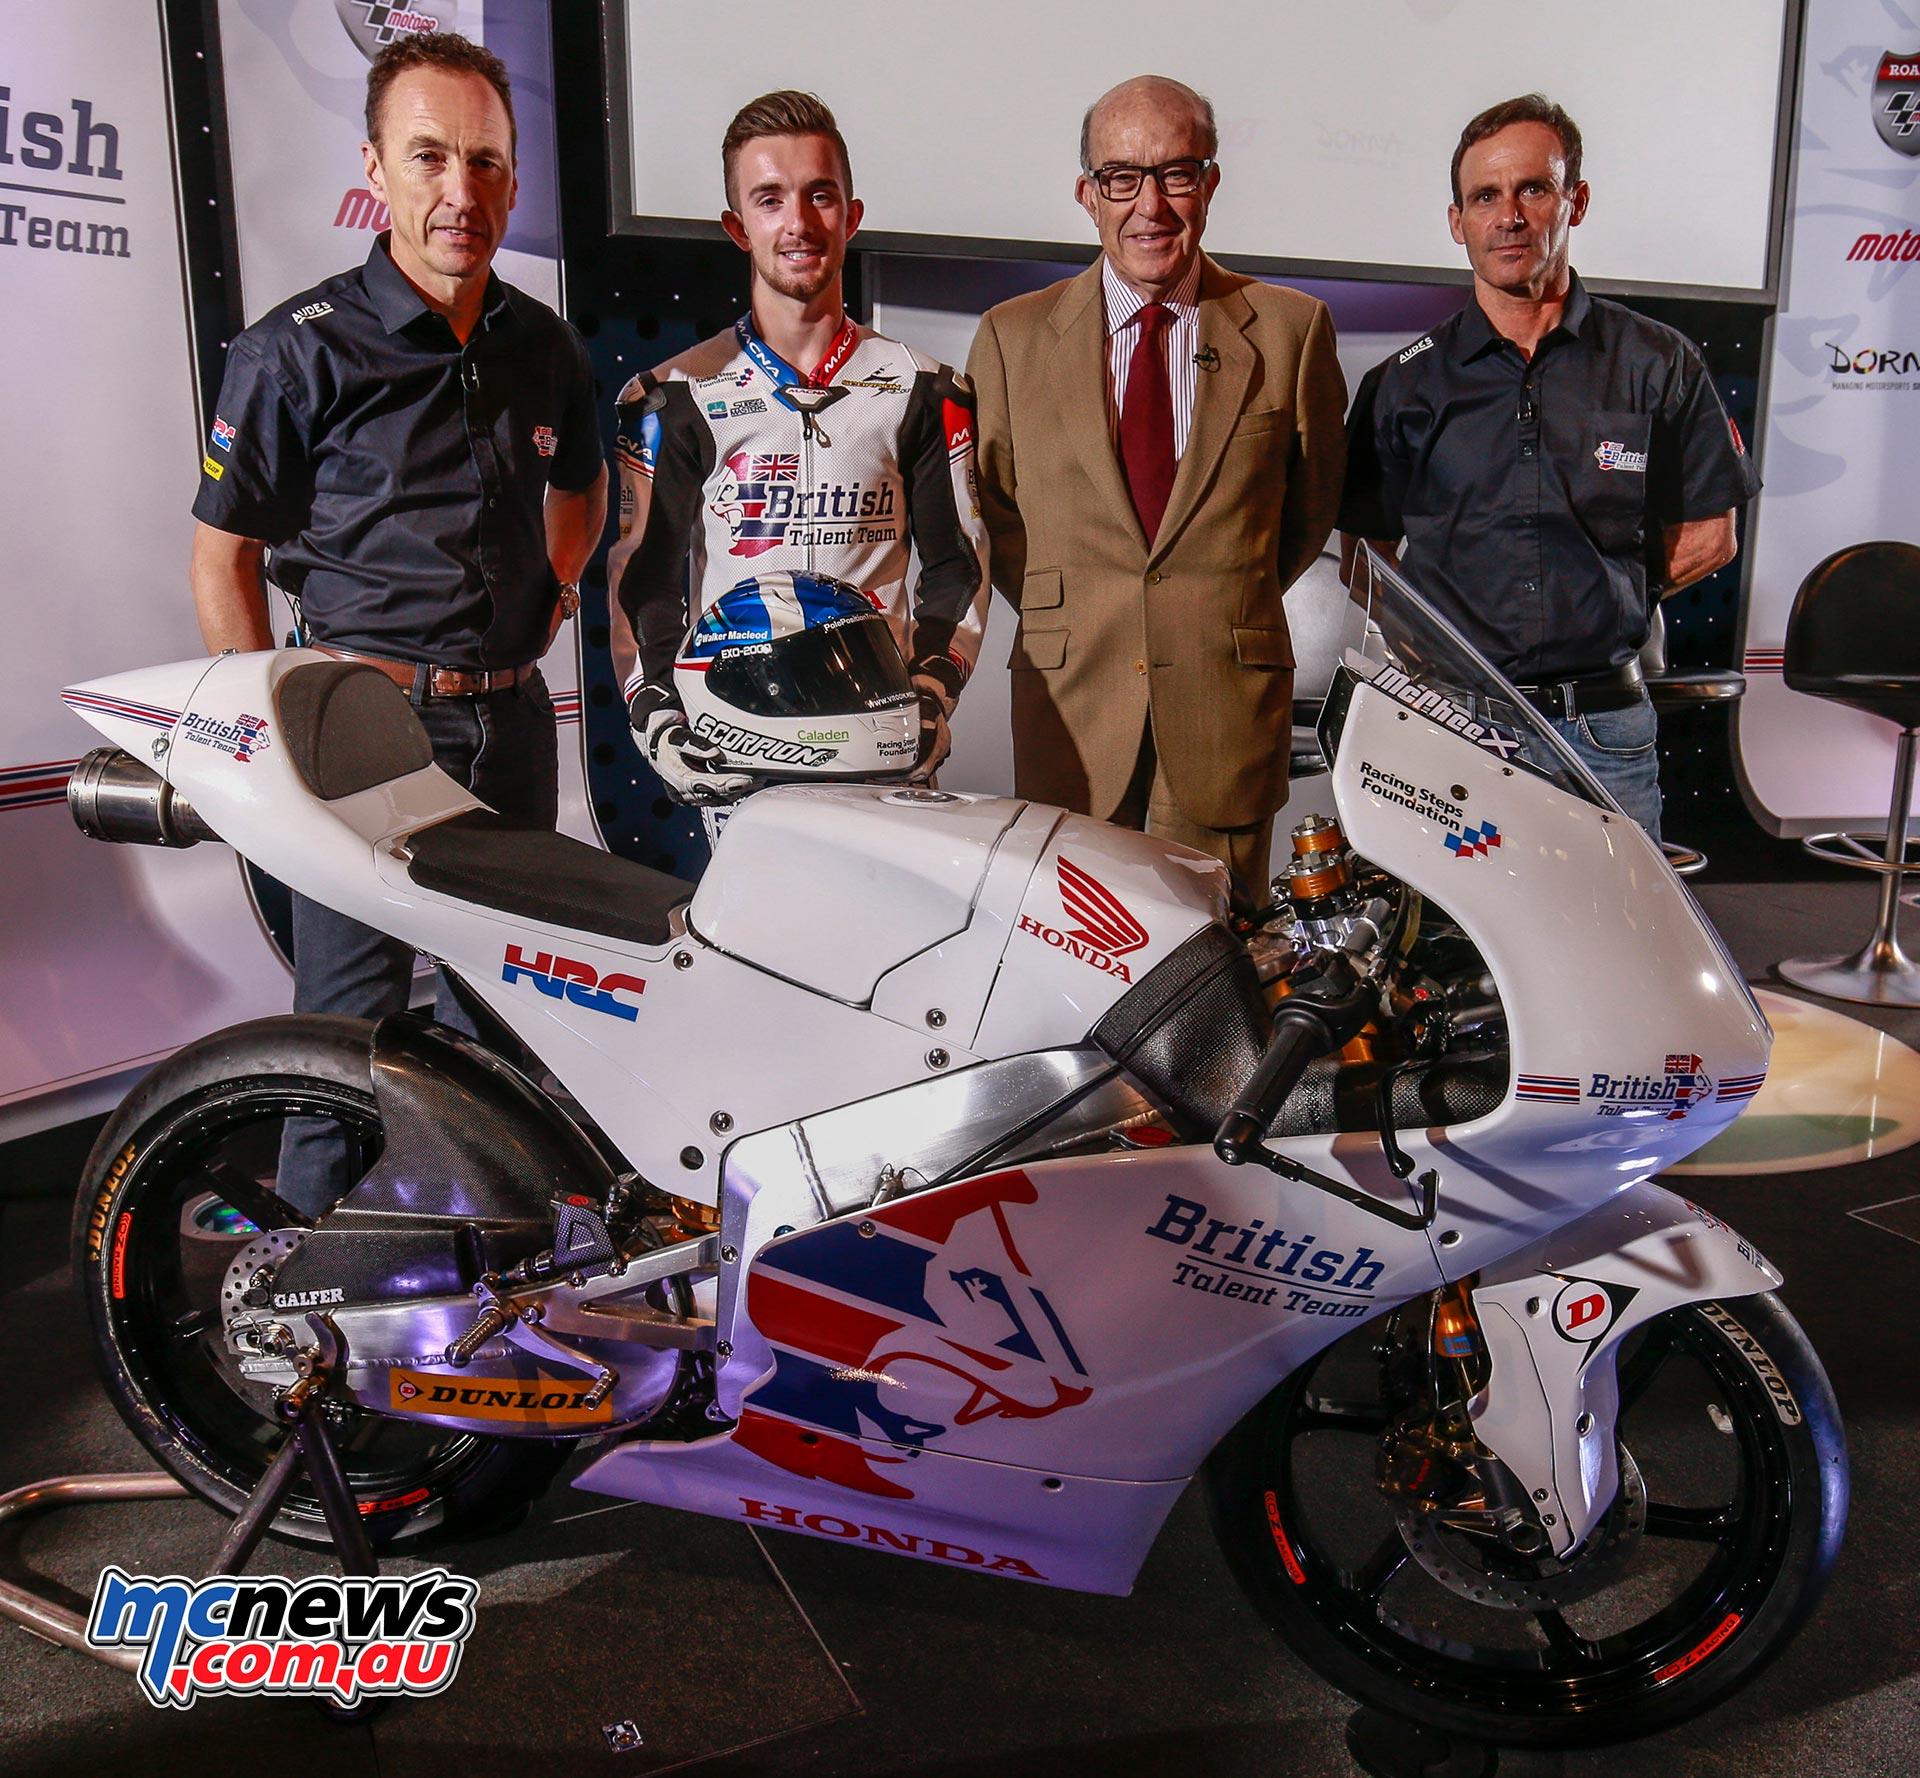 (L-R) Jeremy McWilliams, John McPhee, Carmelo Ezpeleta and Alberto Puig